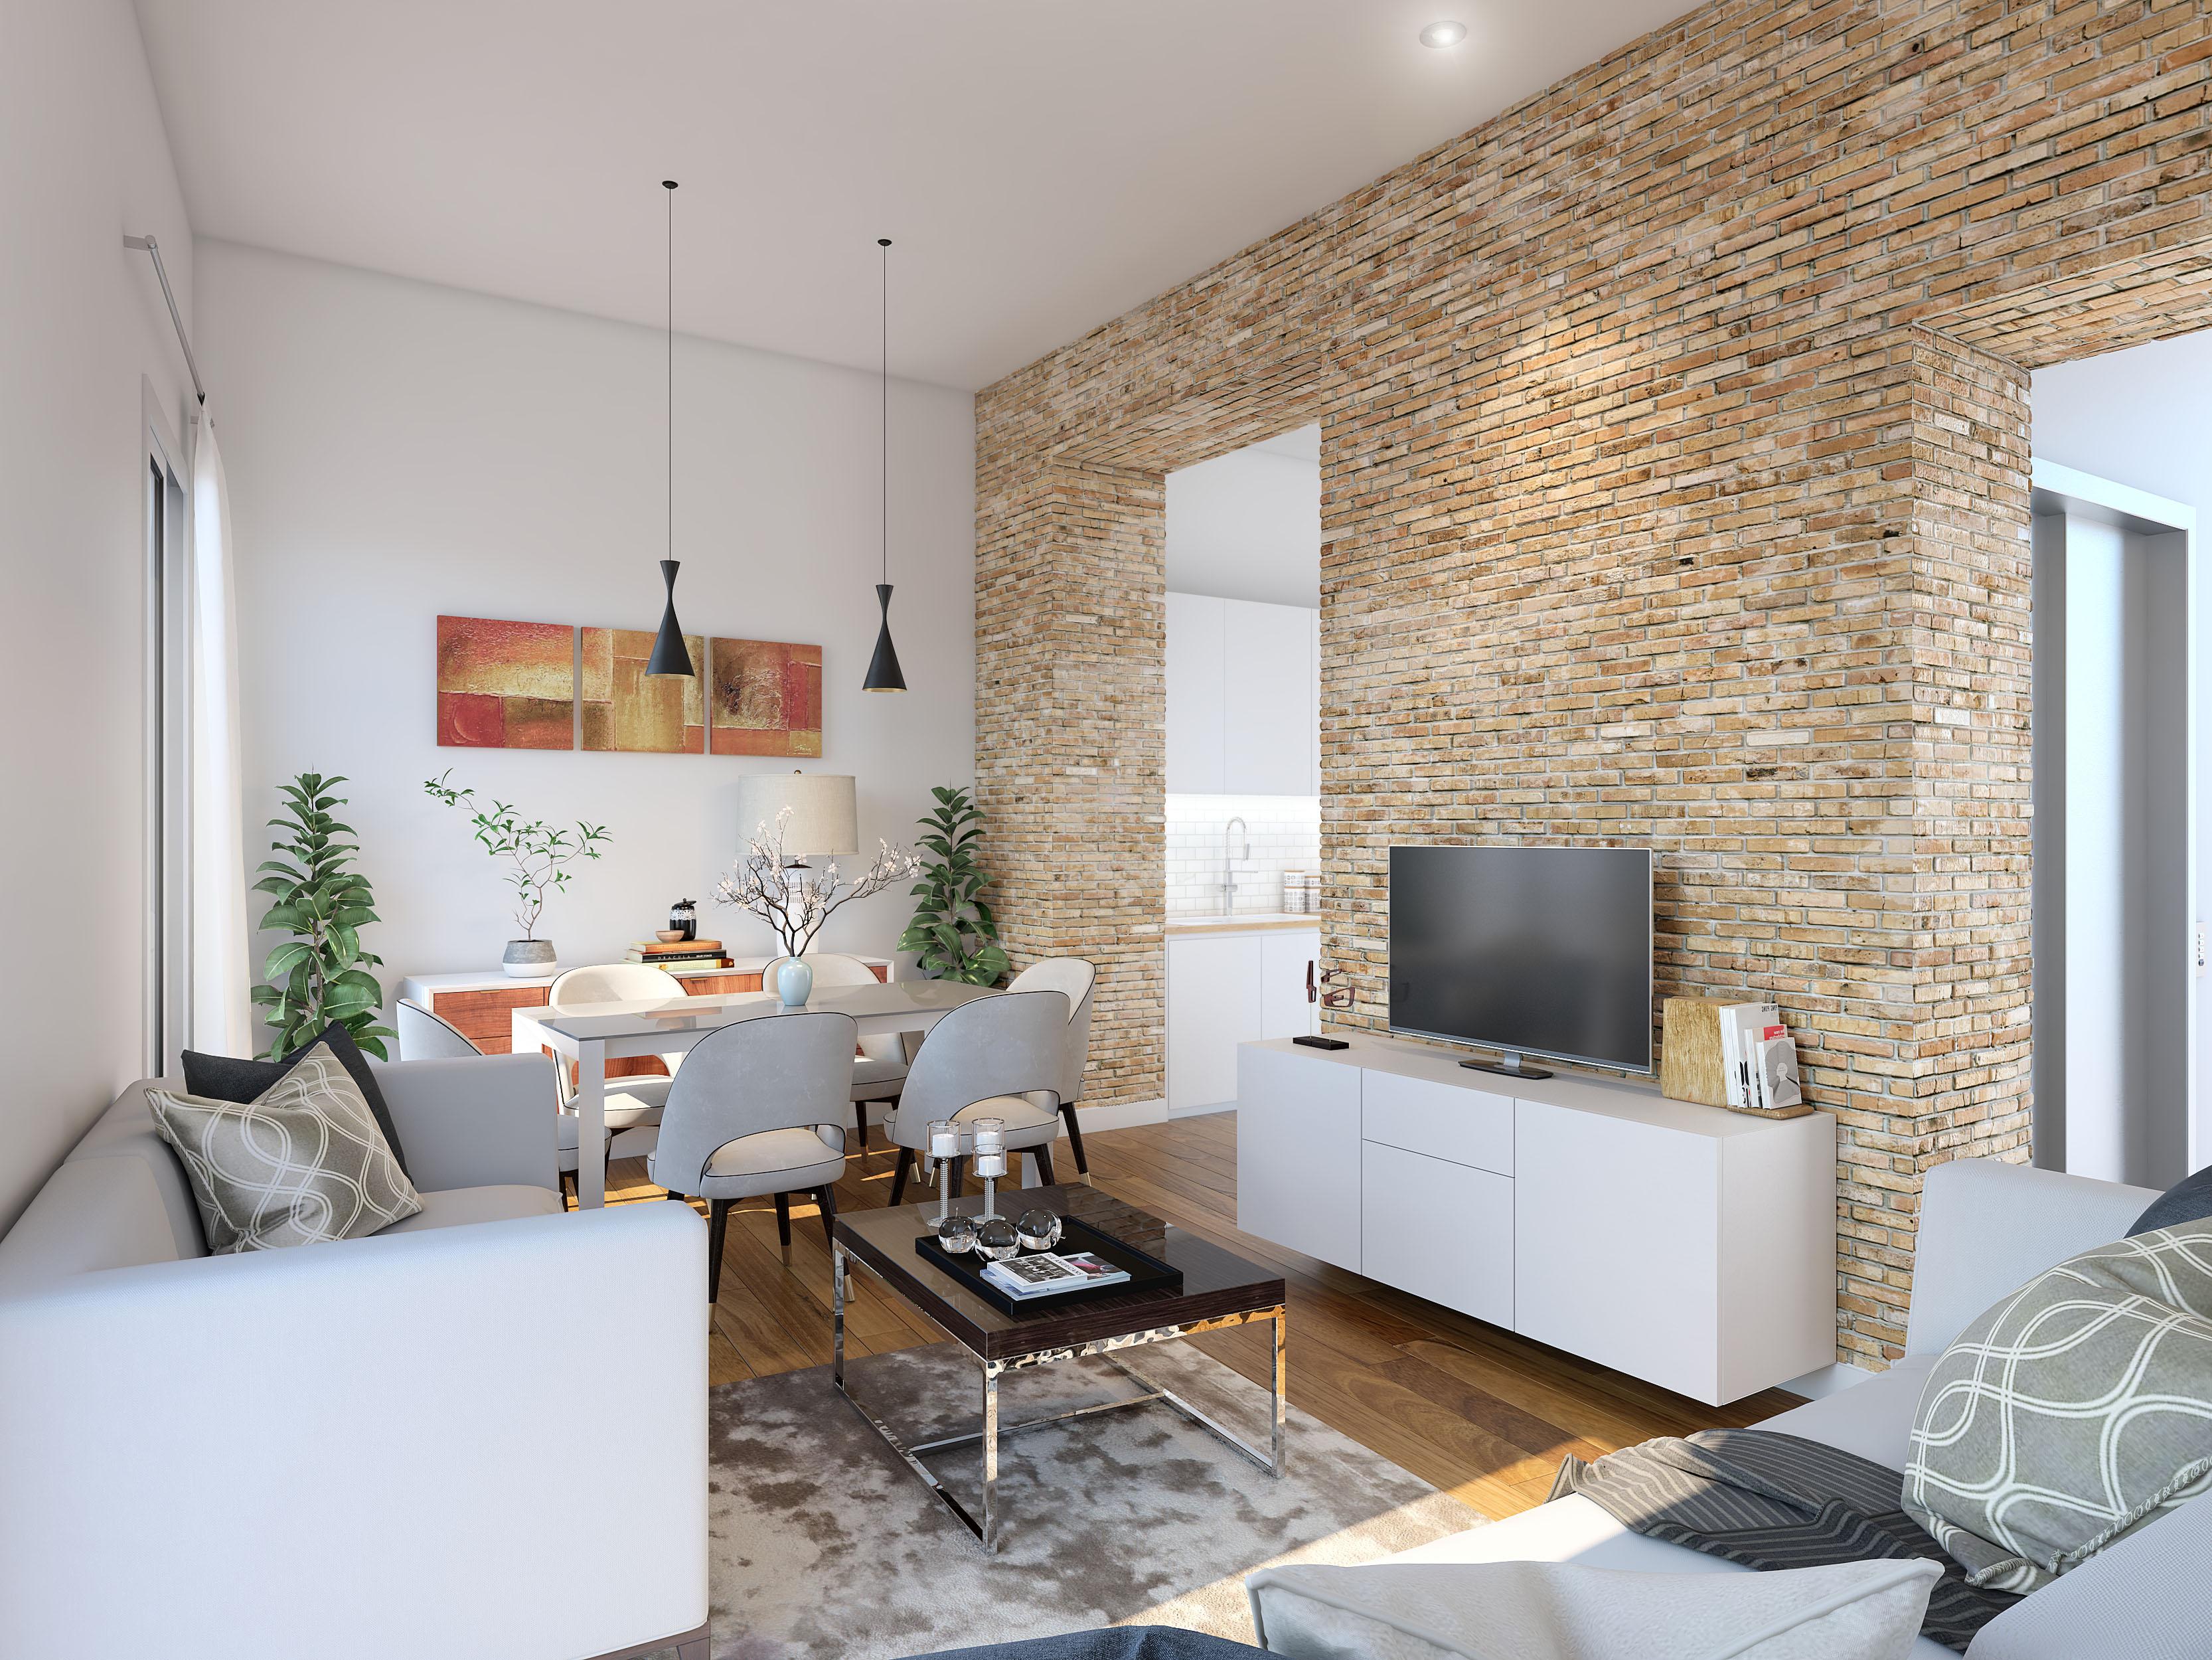 Promoción de viviendas San Lorenzo - Martínez Montañés